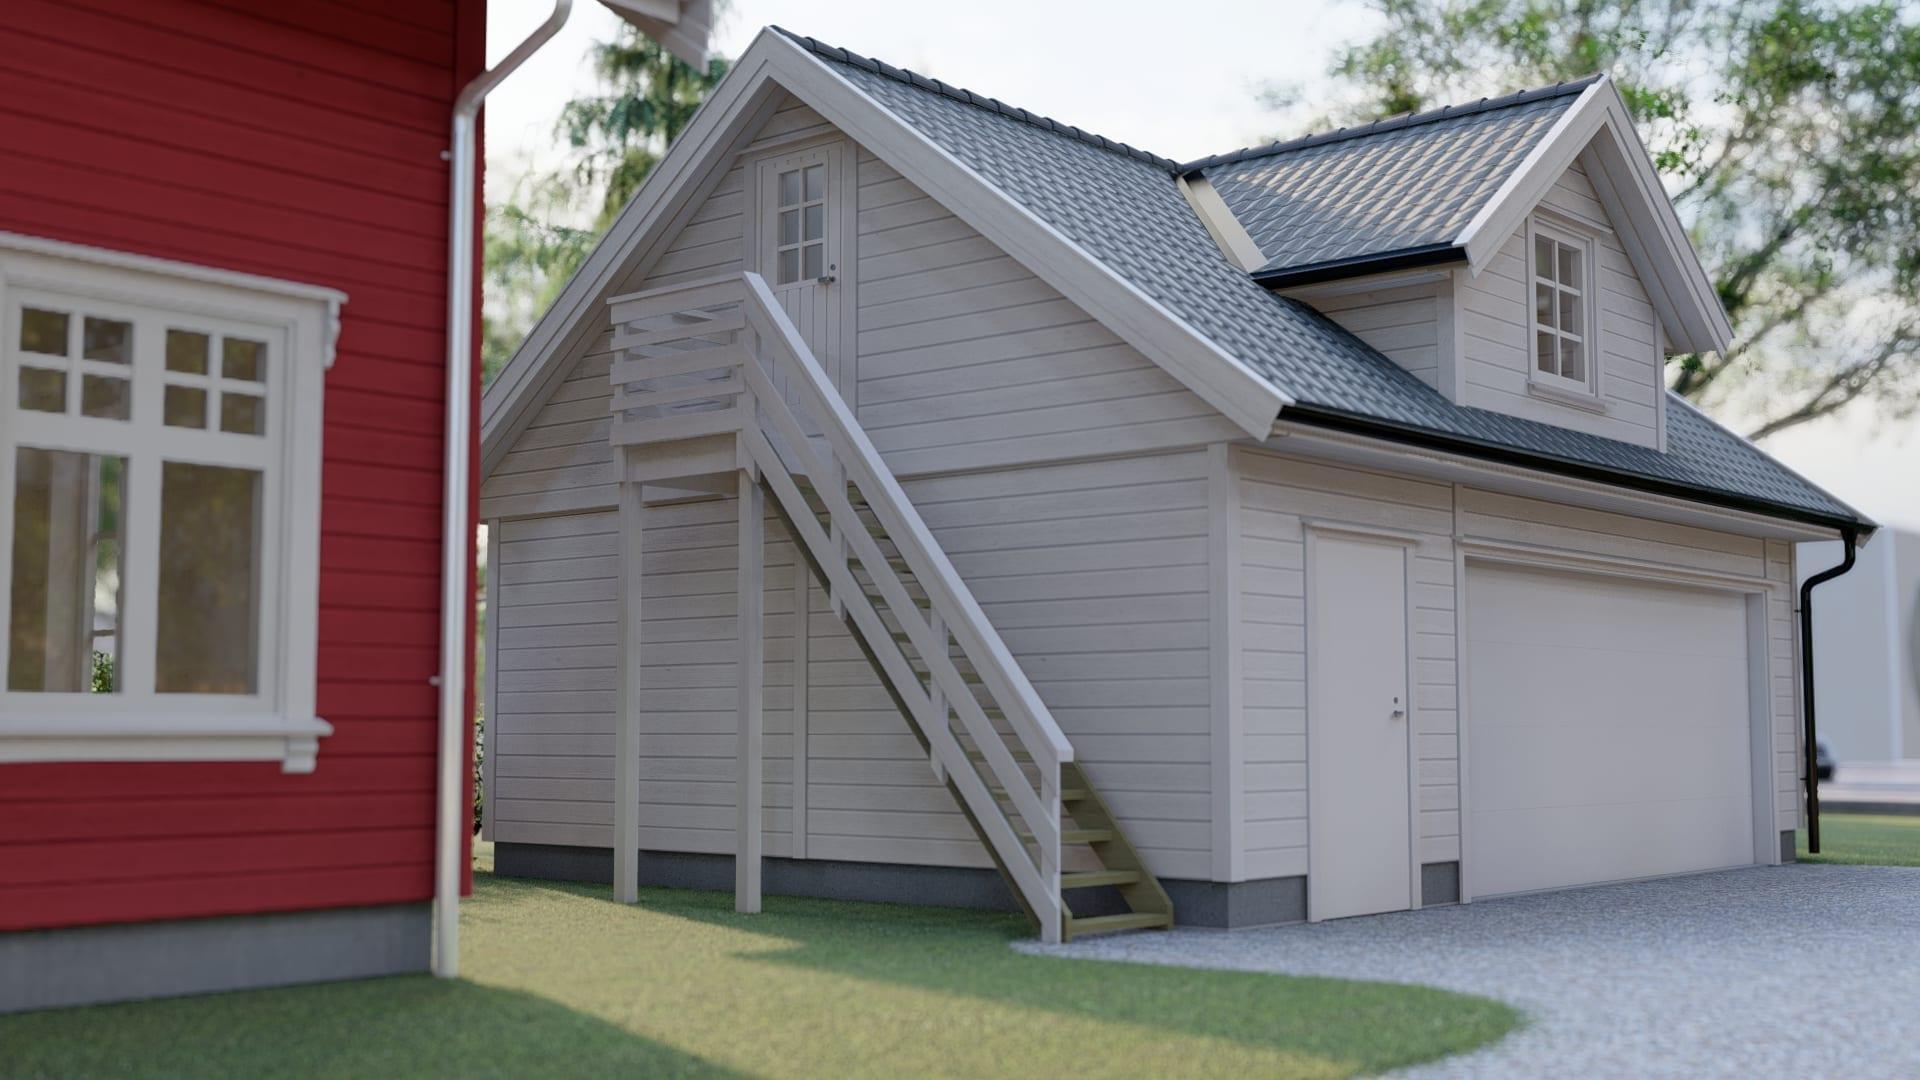 Utvendig trapp garasje